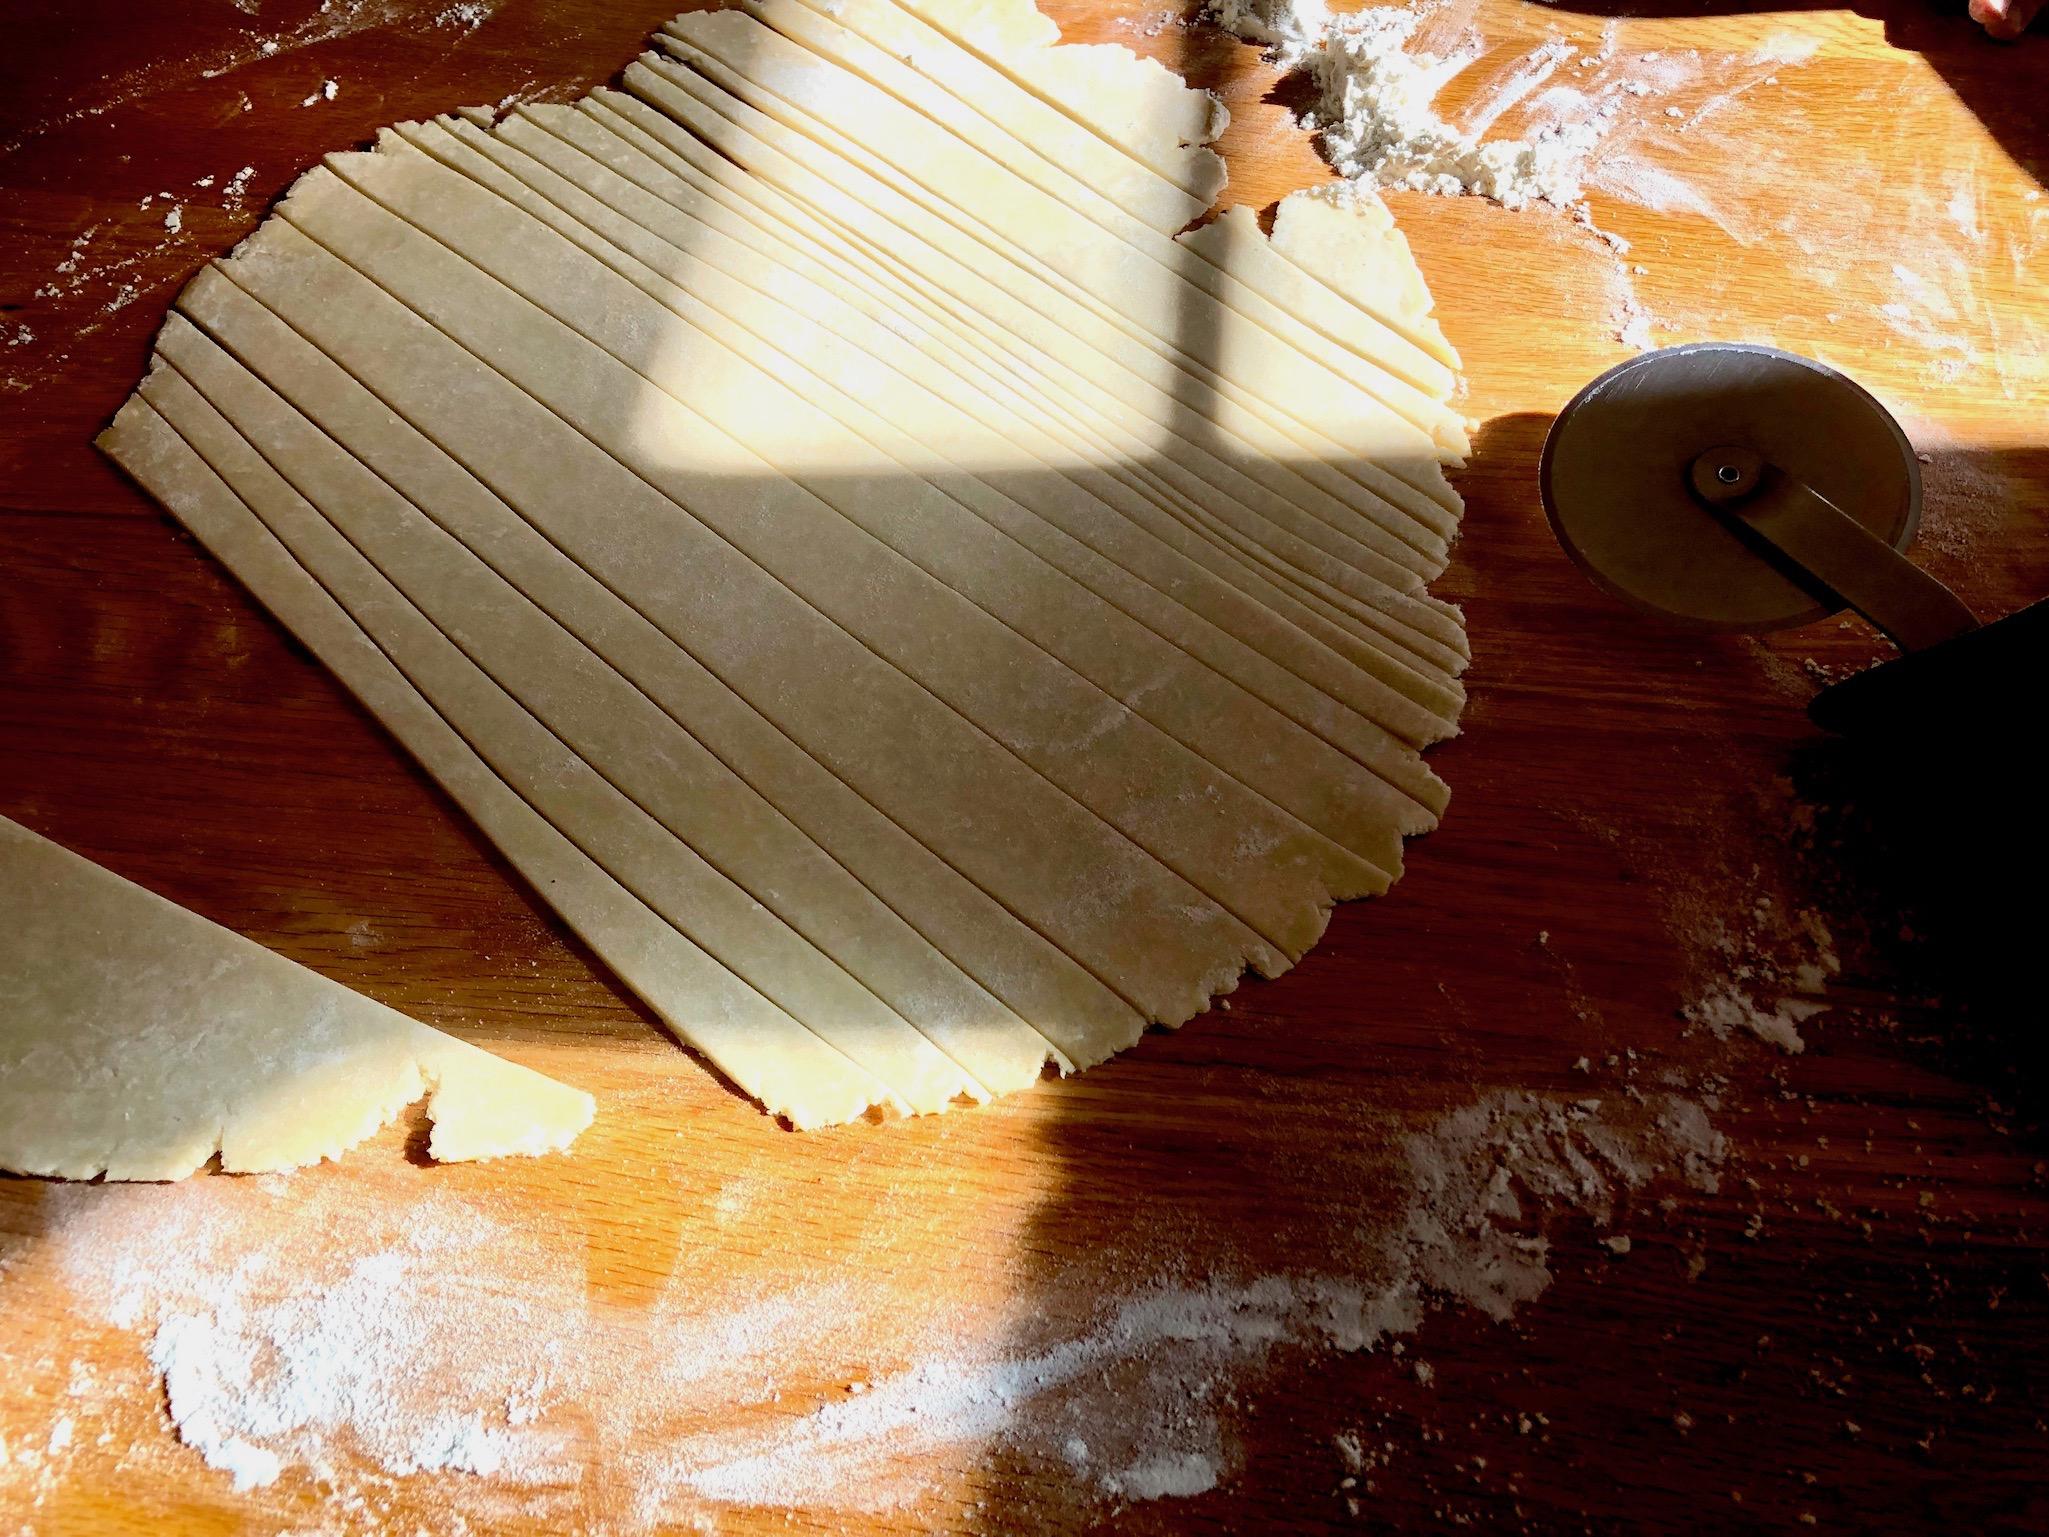 tutorial whimsical braided lattice for pie: beneath the crust